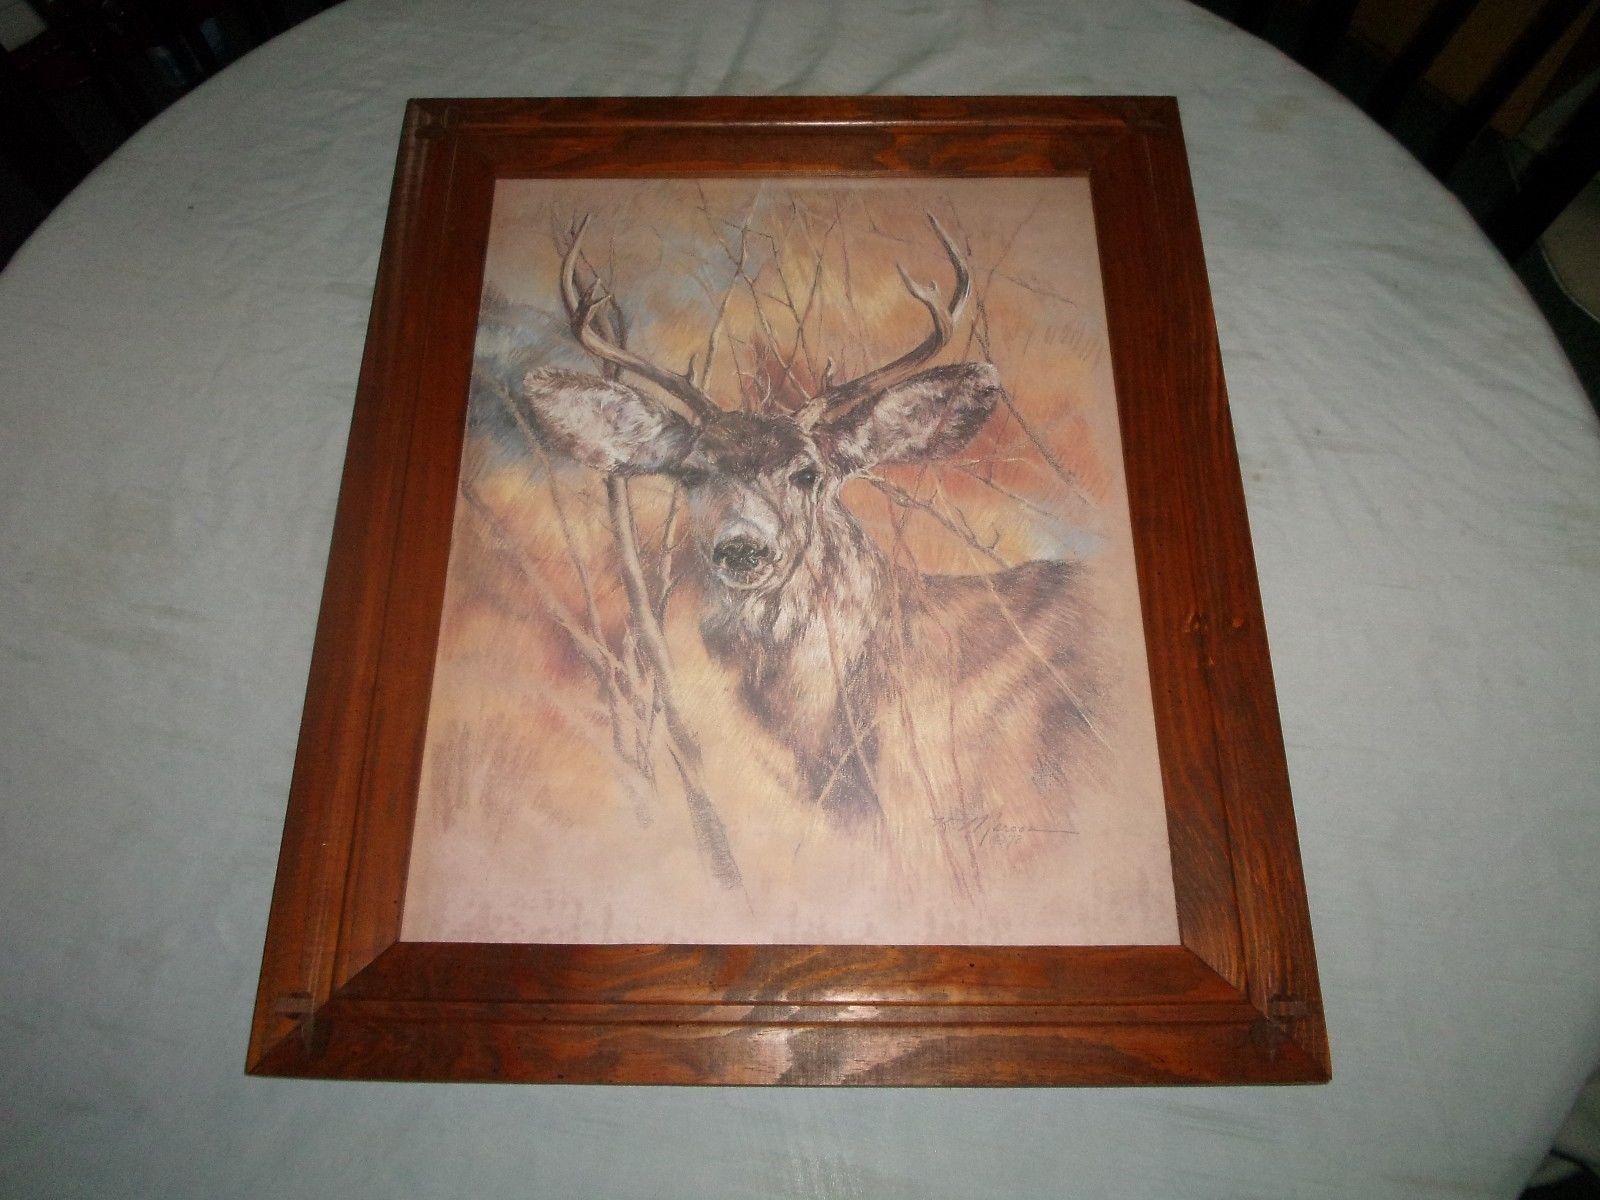 Home Interiors Deer Picture | Vintage Home Interior Homco Deer Figurines Whole Family Buck Doe